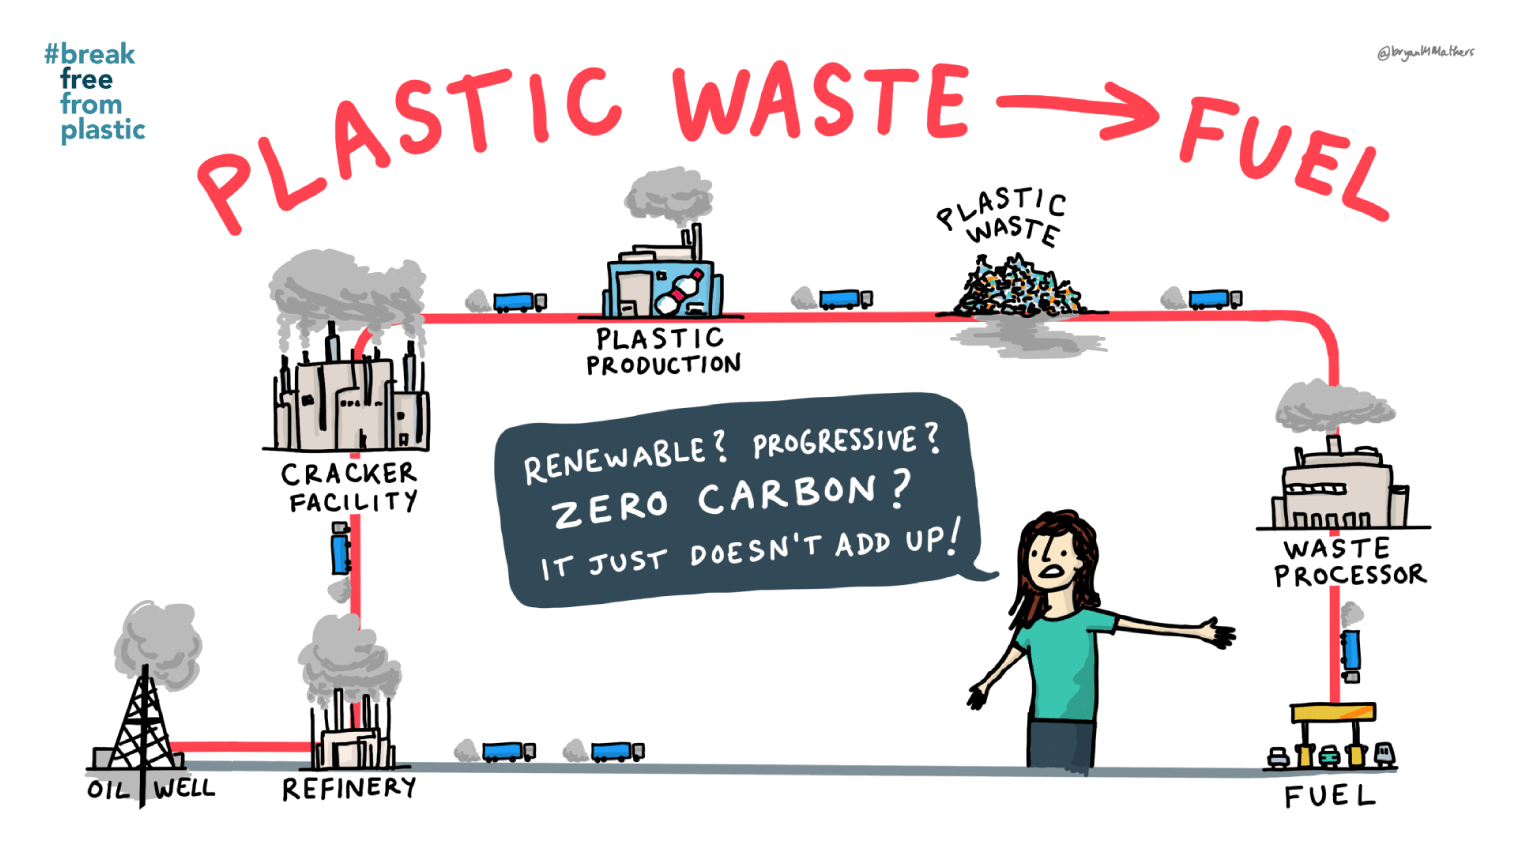 BFFP - Plastic Waste to Fuel